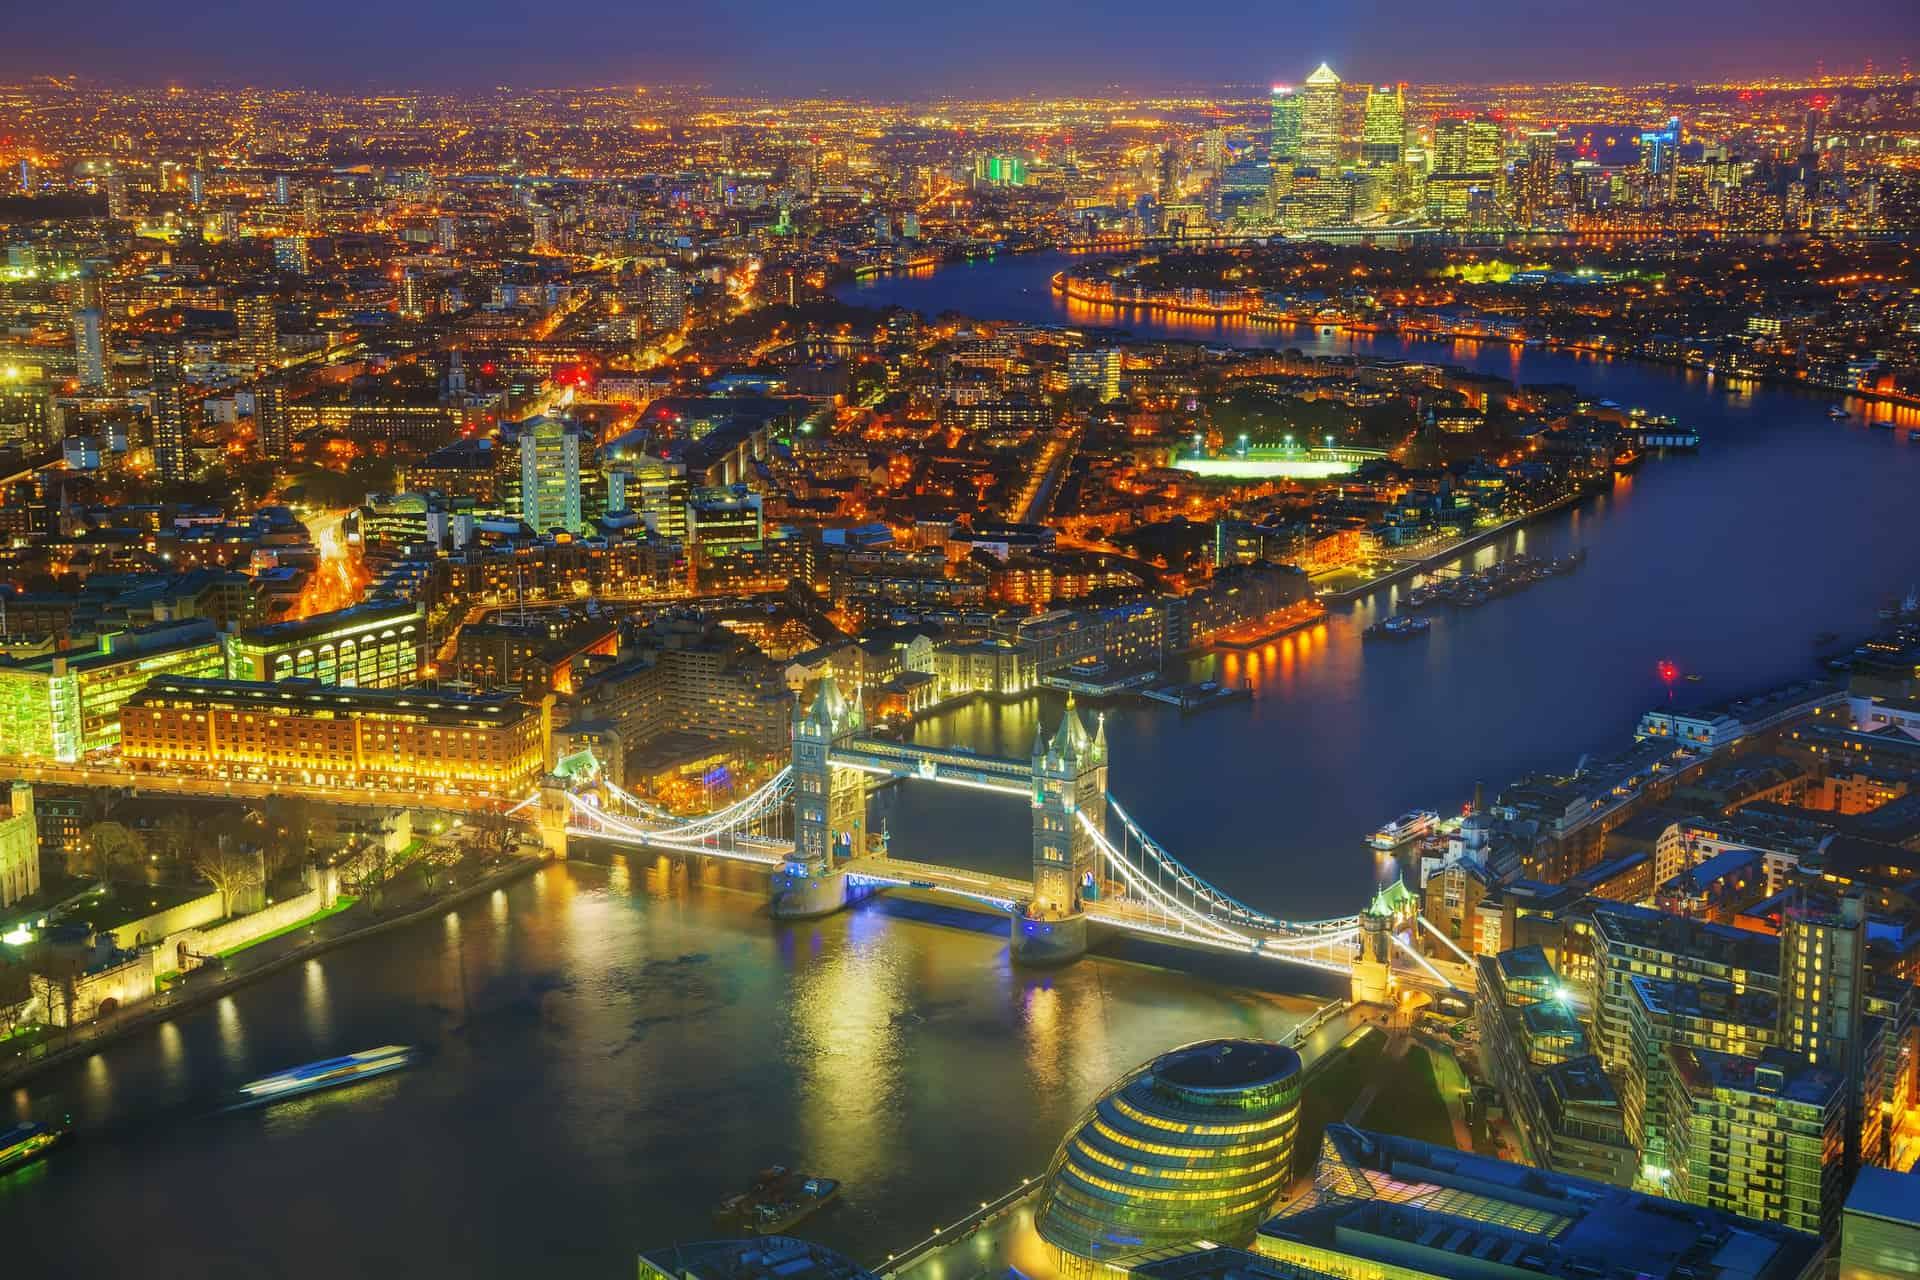 Storbritannien London city og Tower bridge